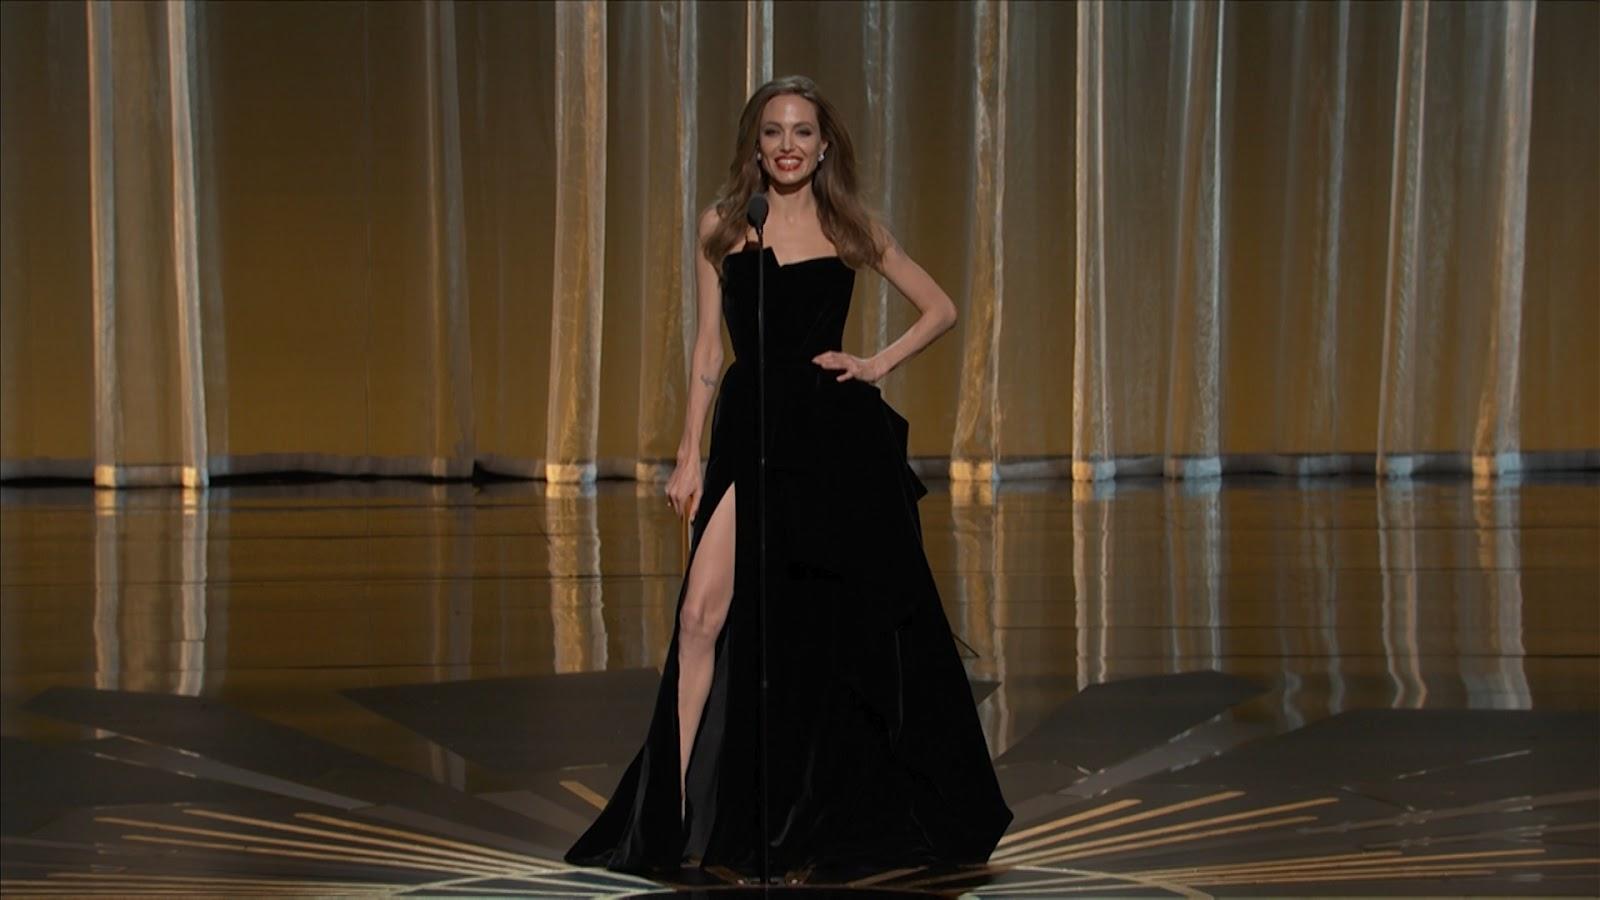 http://3.bp.blogspot.com/-GAQc4Jm98lA/T1suPiFGJ4I/AAAAAAAAAio/rrSVQrUA8Lw/s1600/Angelina_Jolie_Oscars_2012_1080i.mpg.Standbild003.jpg